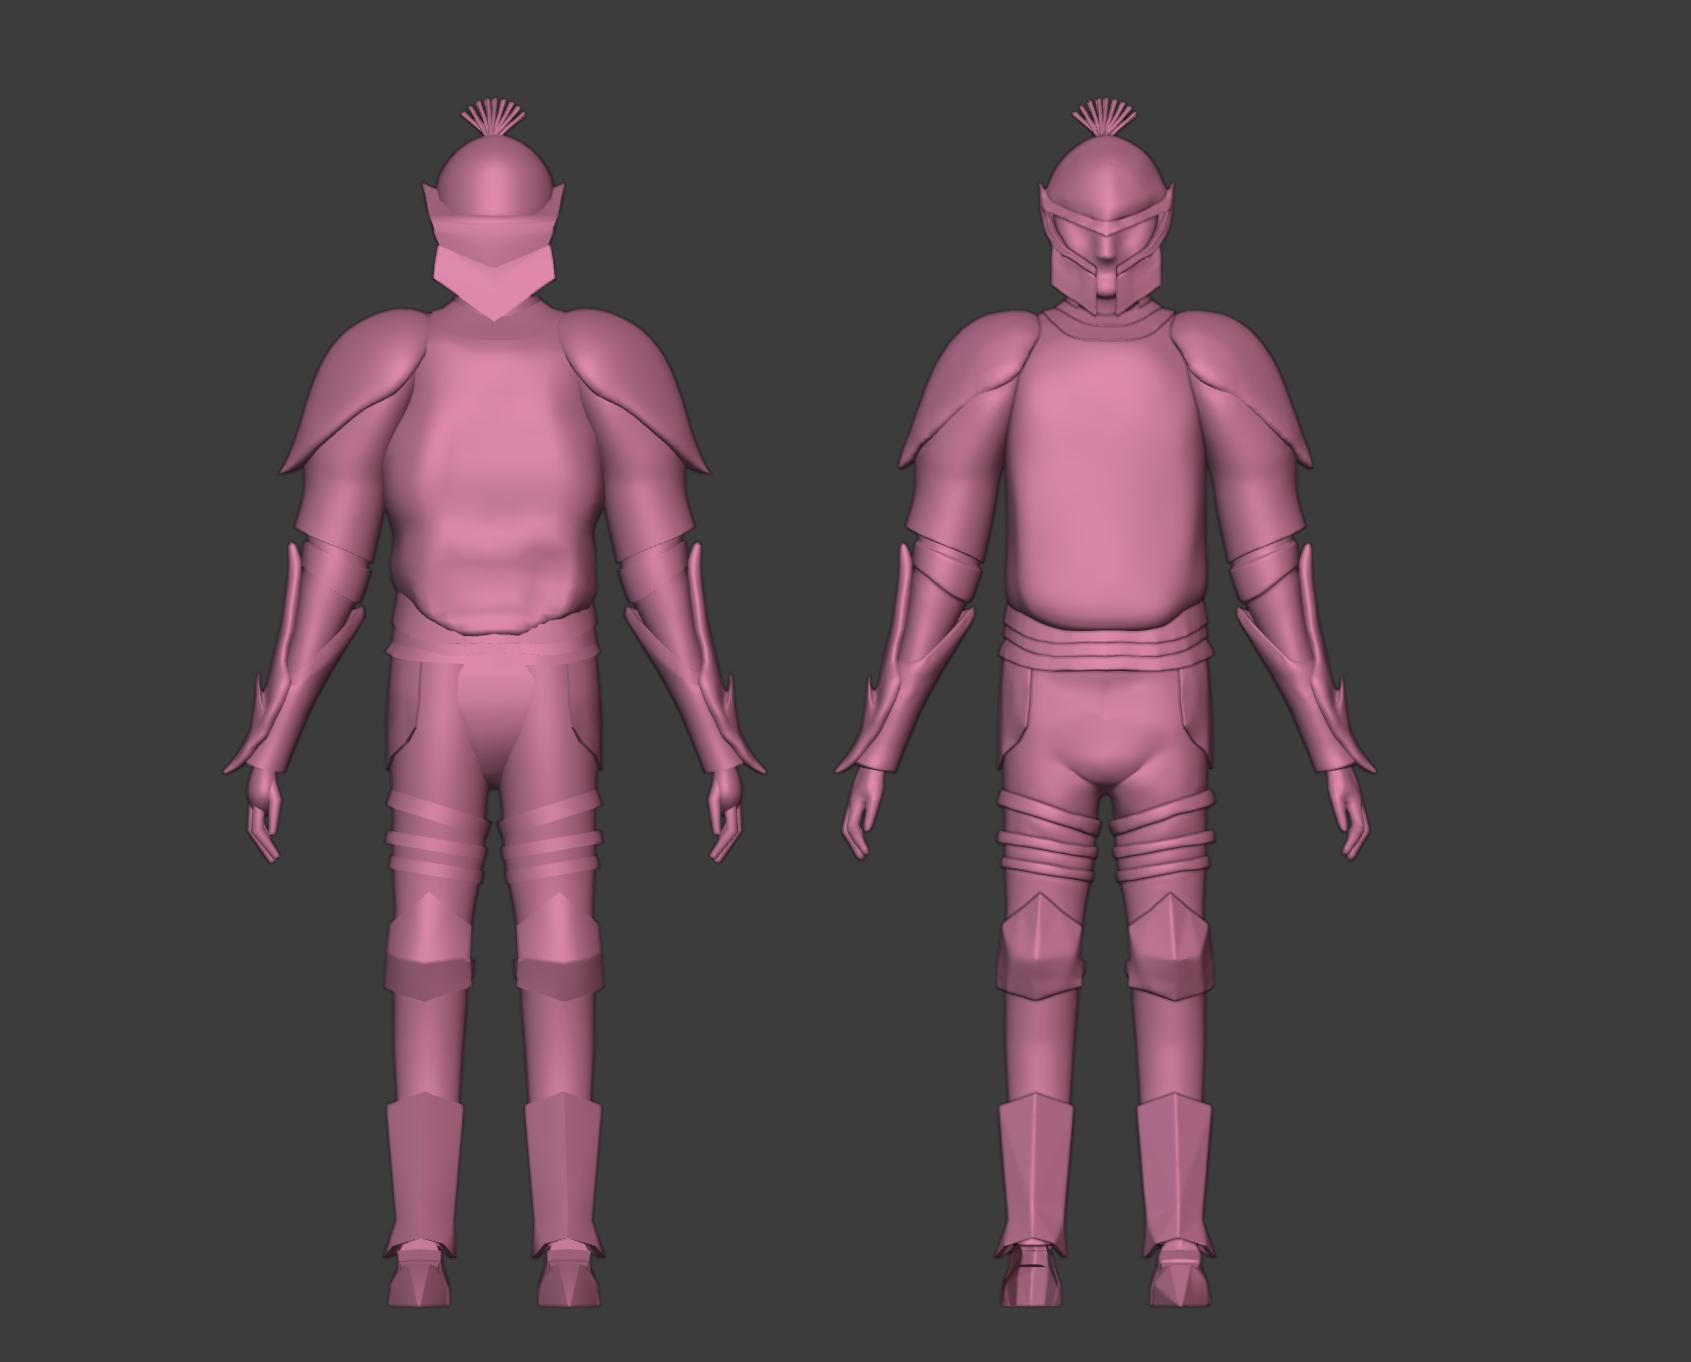 4 guards model progress